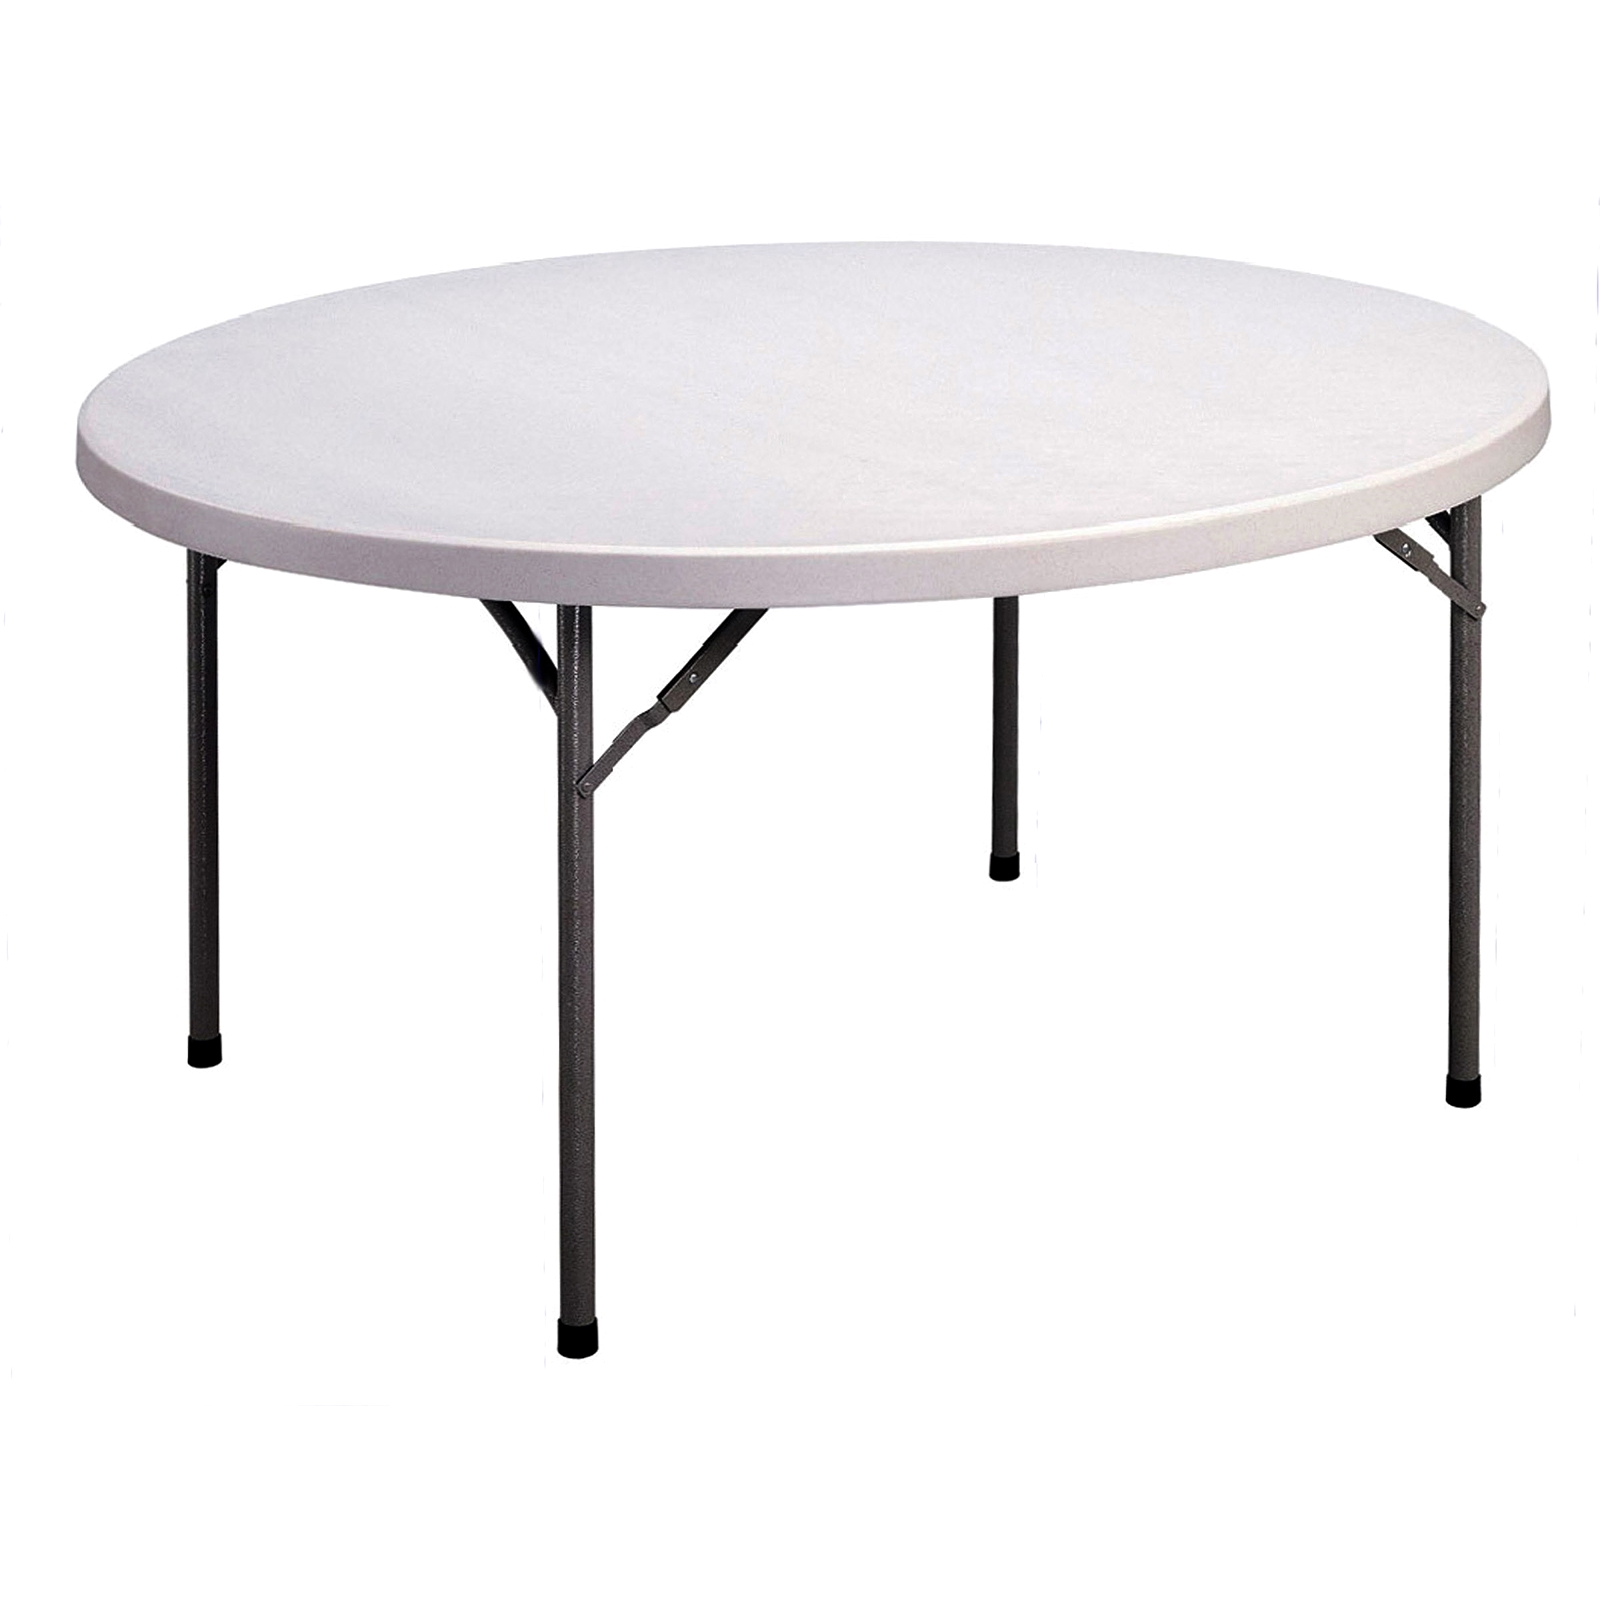 9c4864c0d4f6a2 Table de plastique ronde   Alpha-Vico